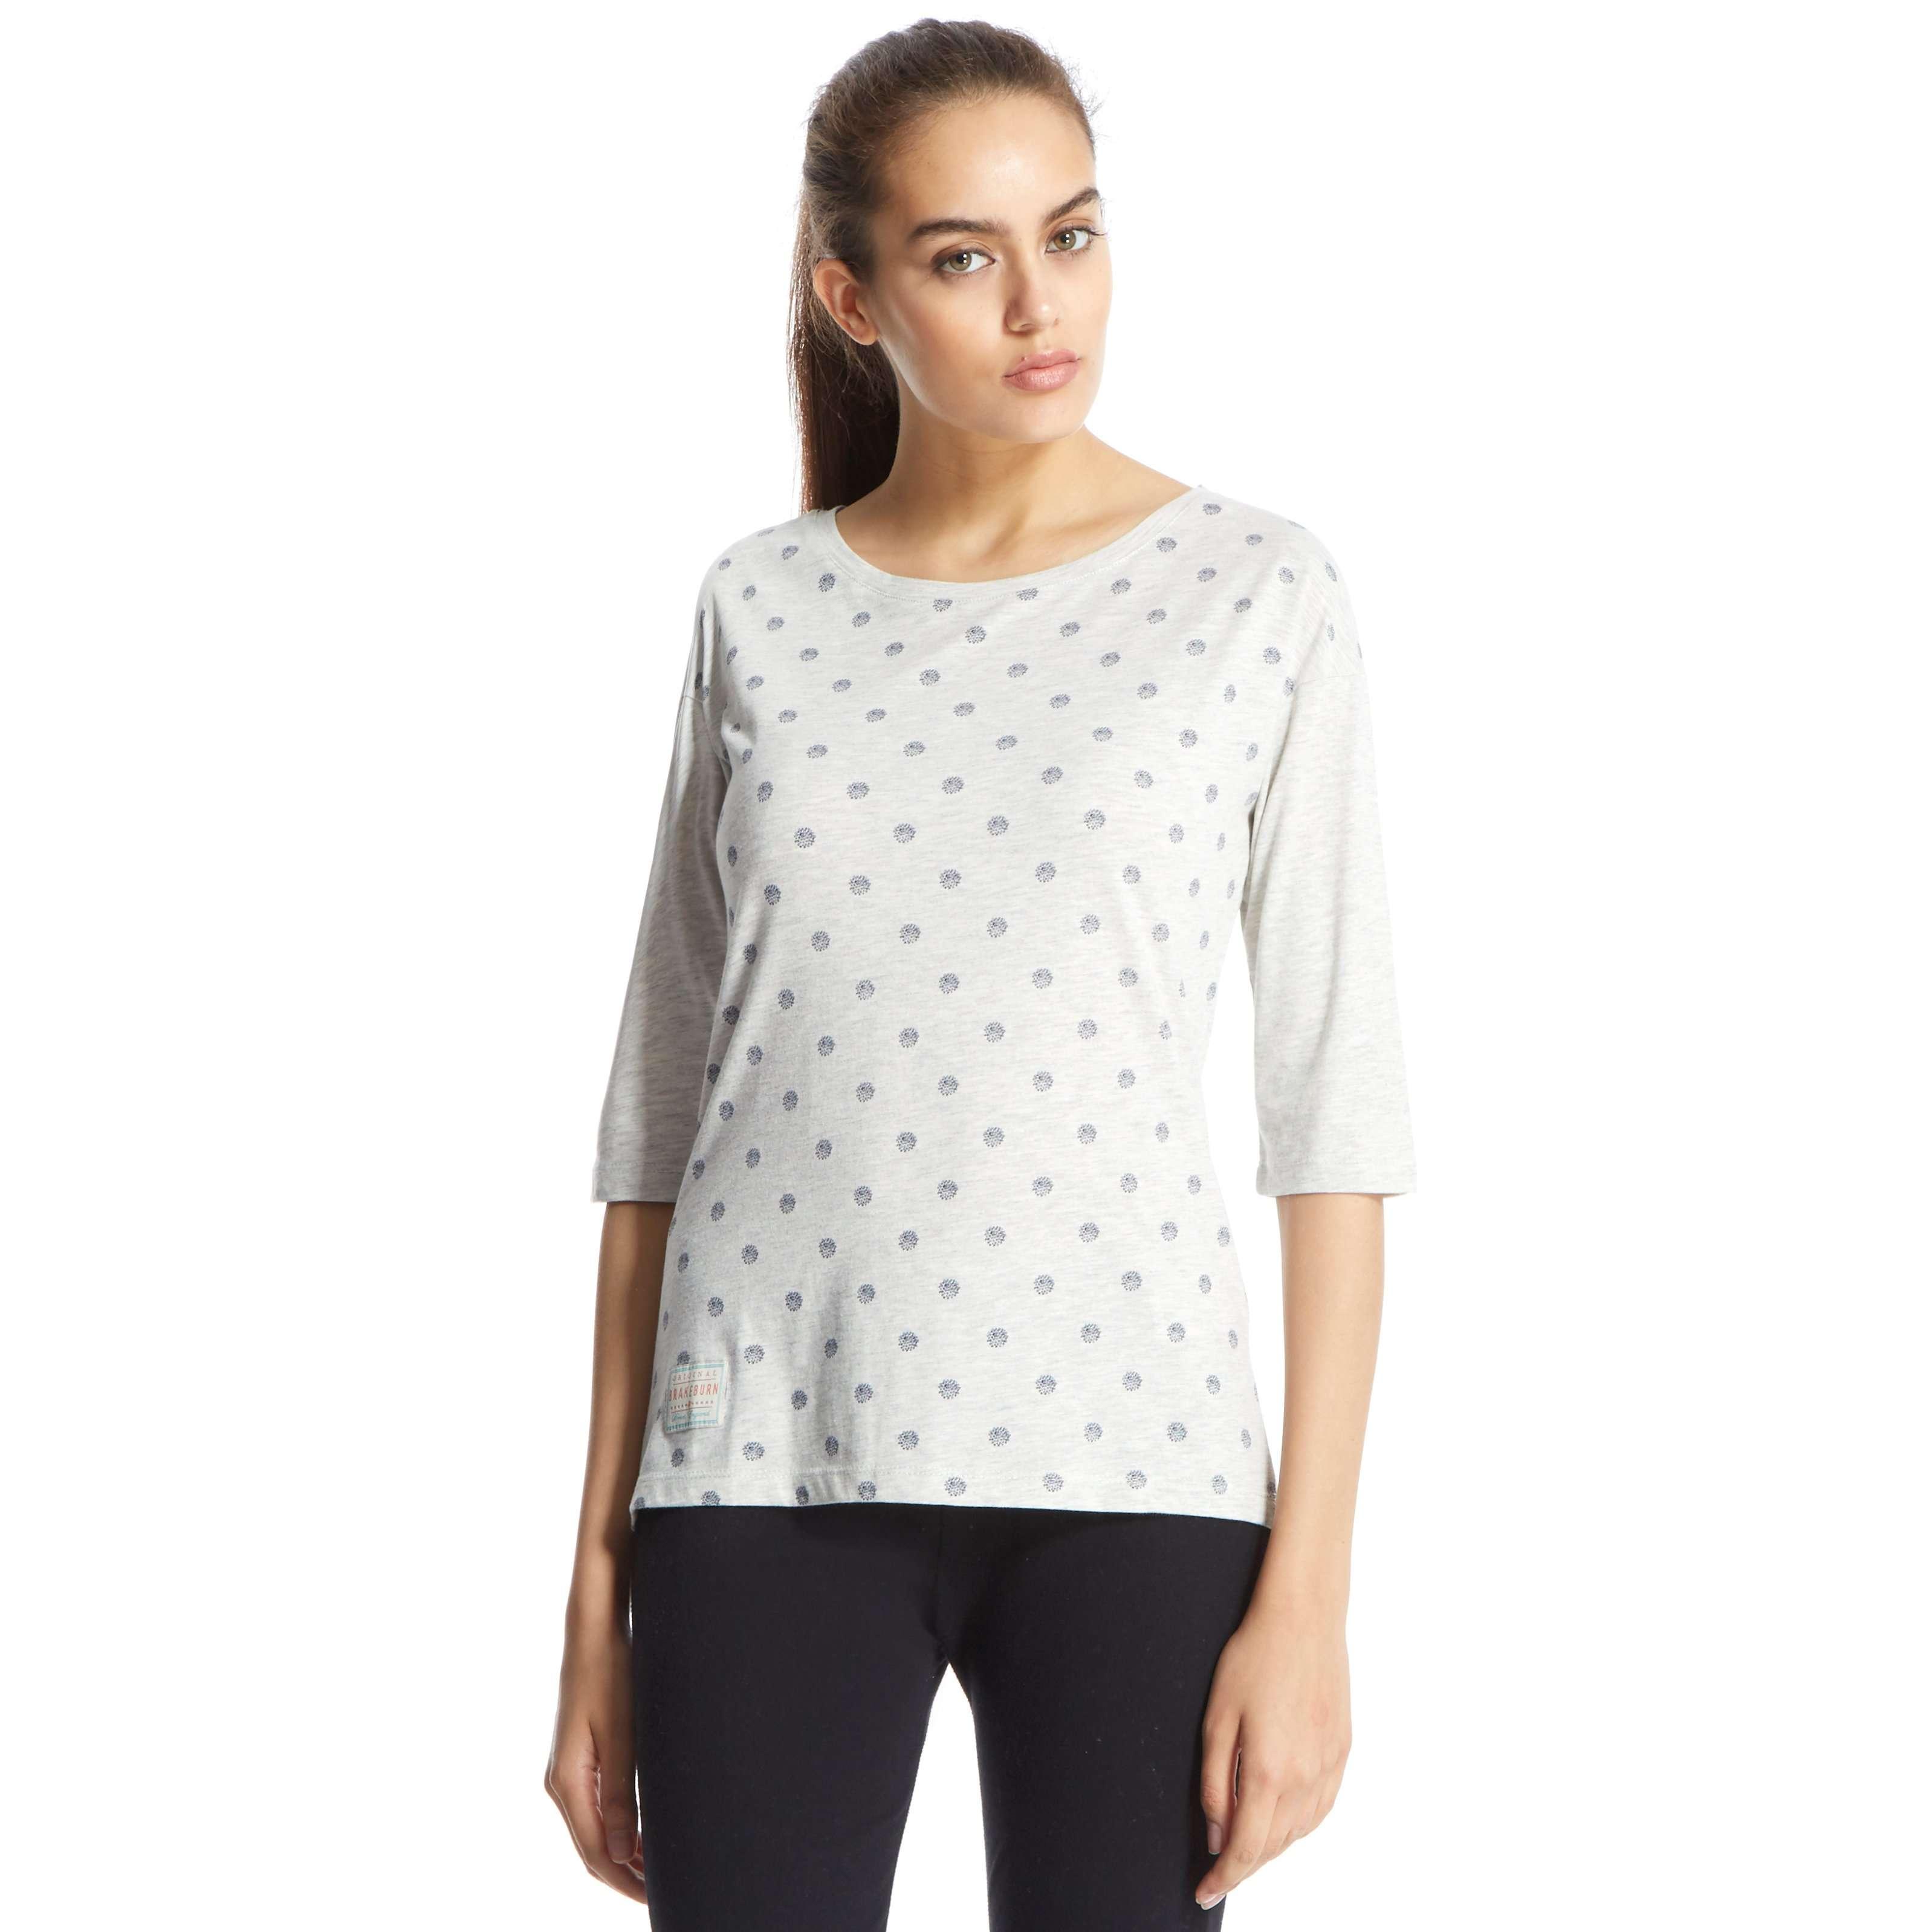 BRAKEBURN Women's Polka 3/4 Sleeve Shirt